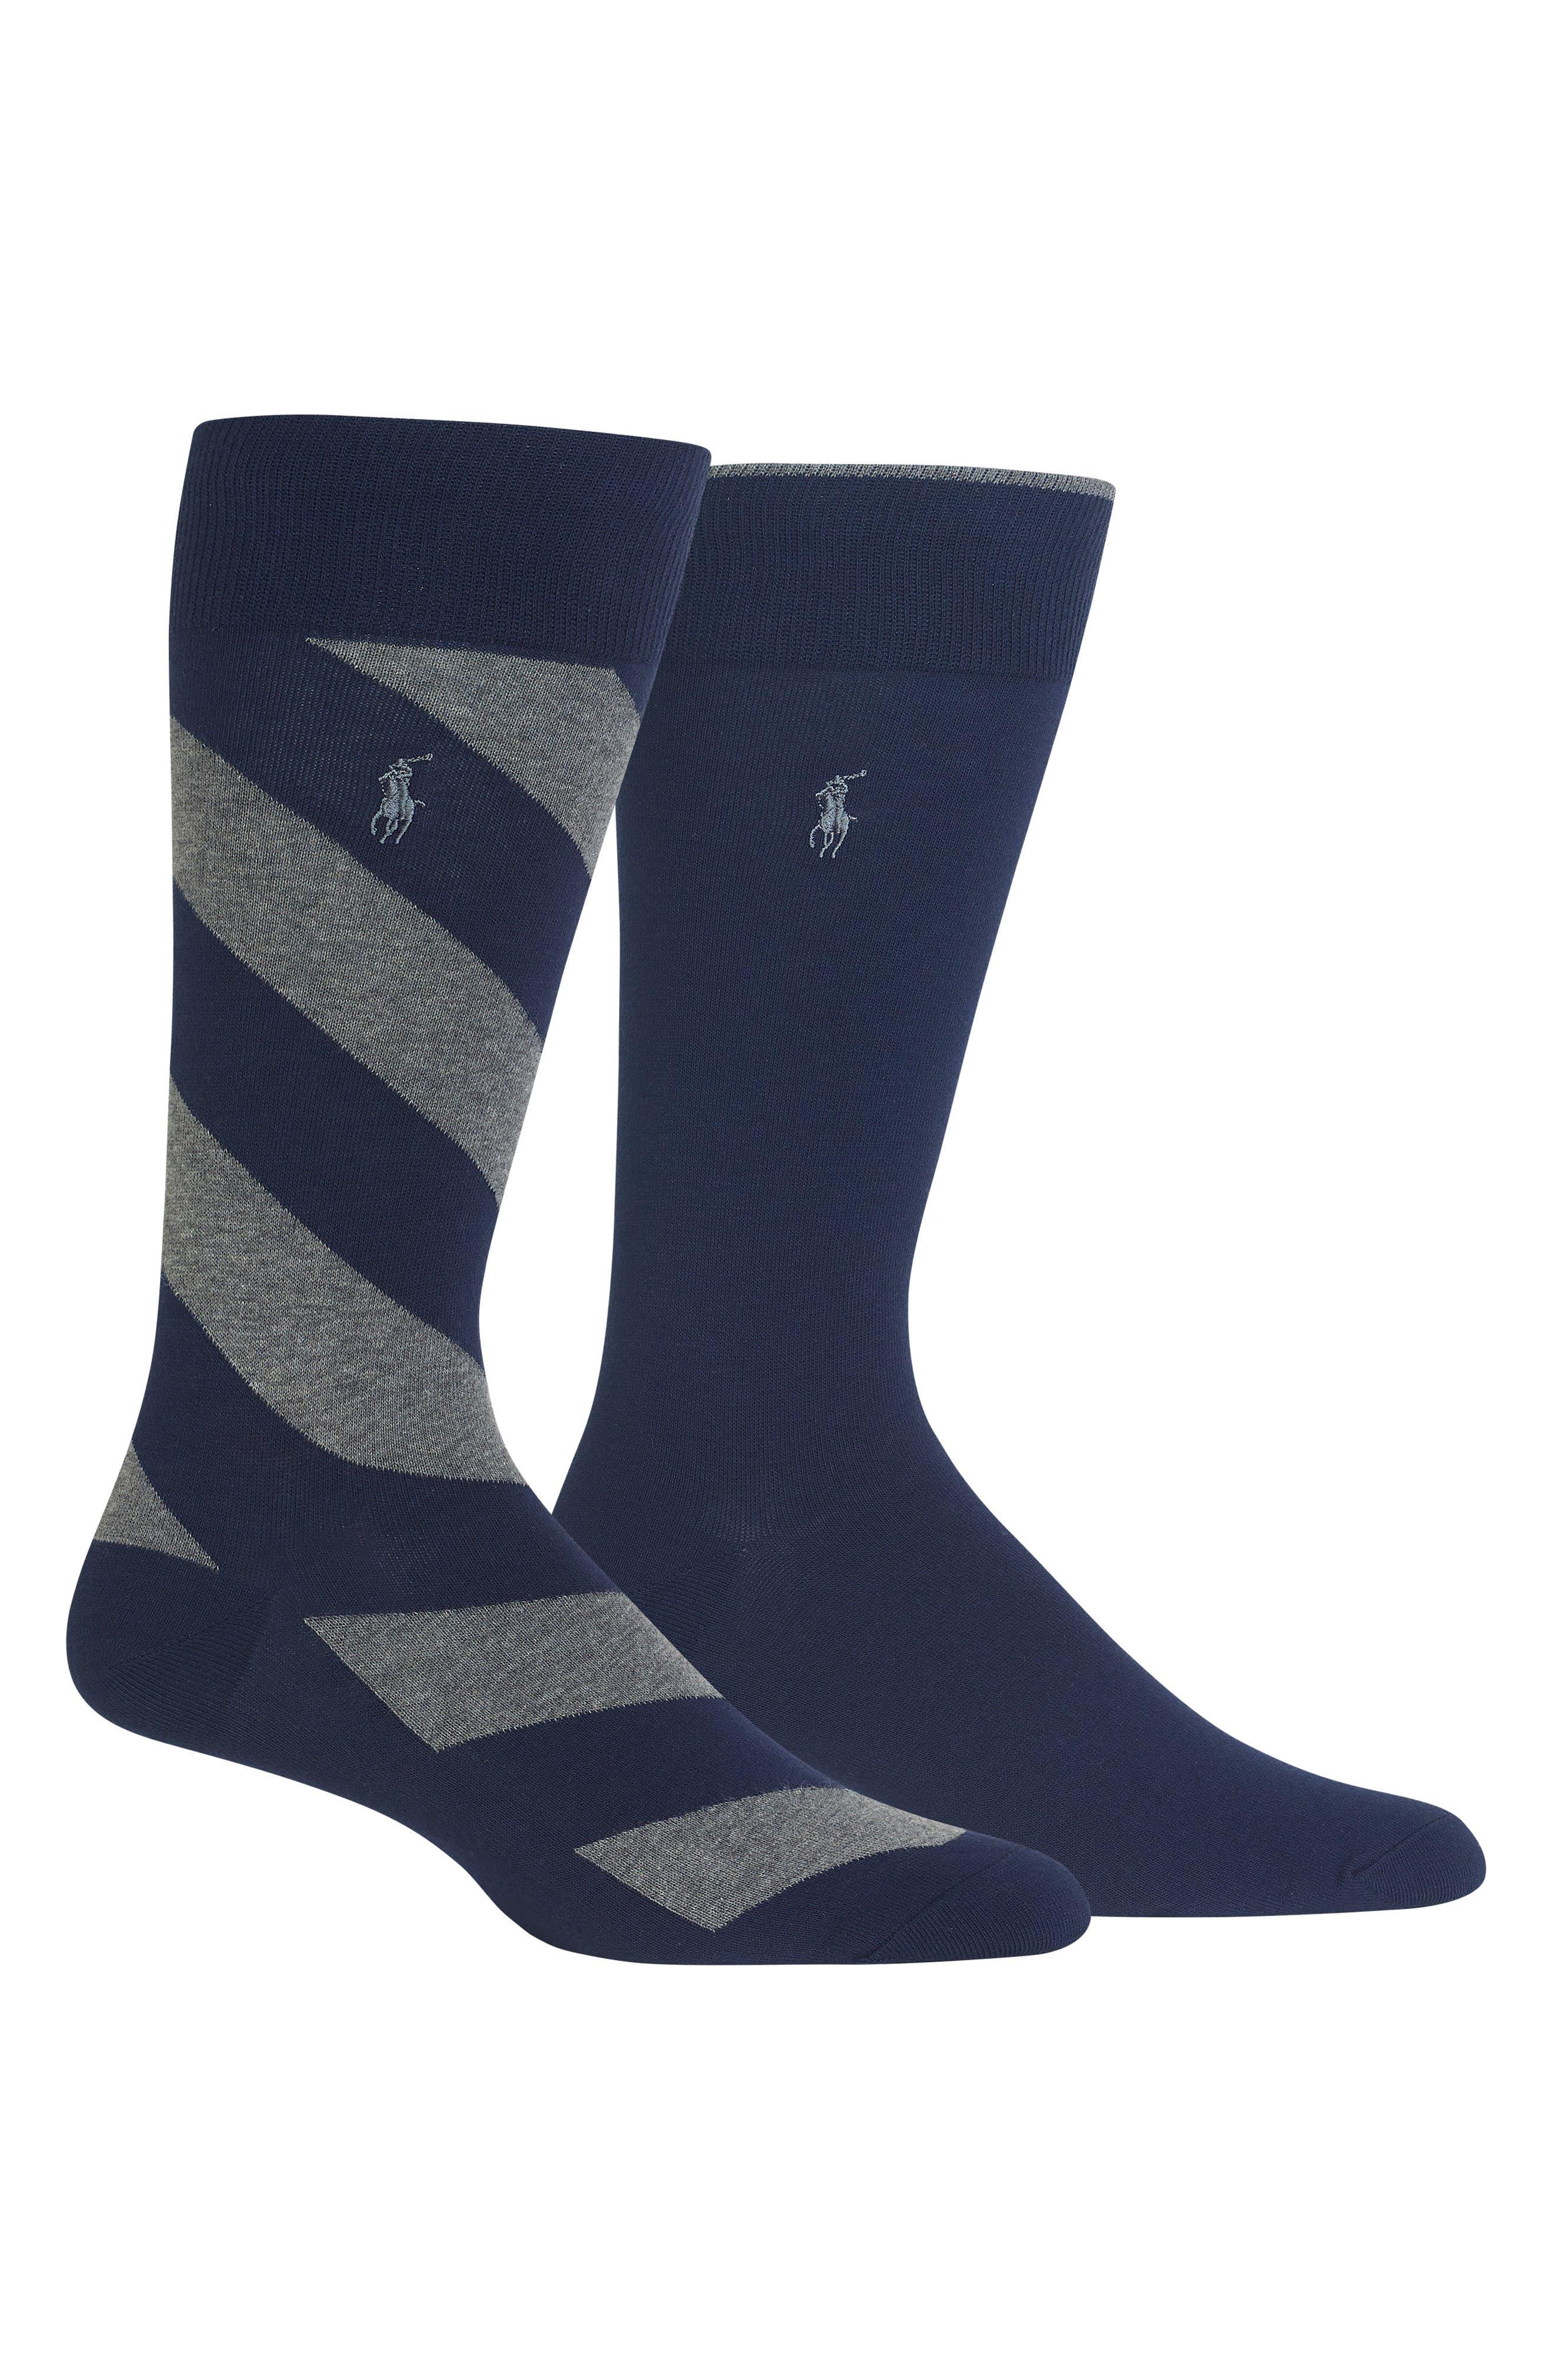 2-Pack Diagonal Stripe & Solid Socks,                             Main thumbnail 1, color,                             NAVY